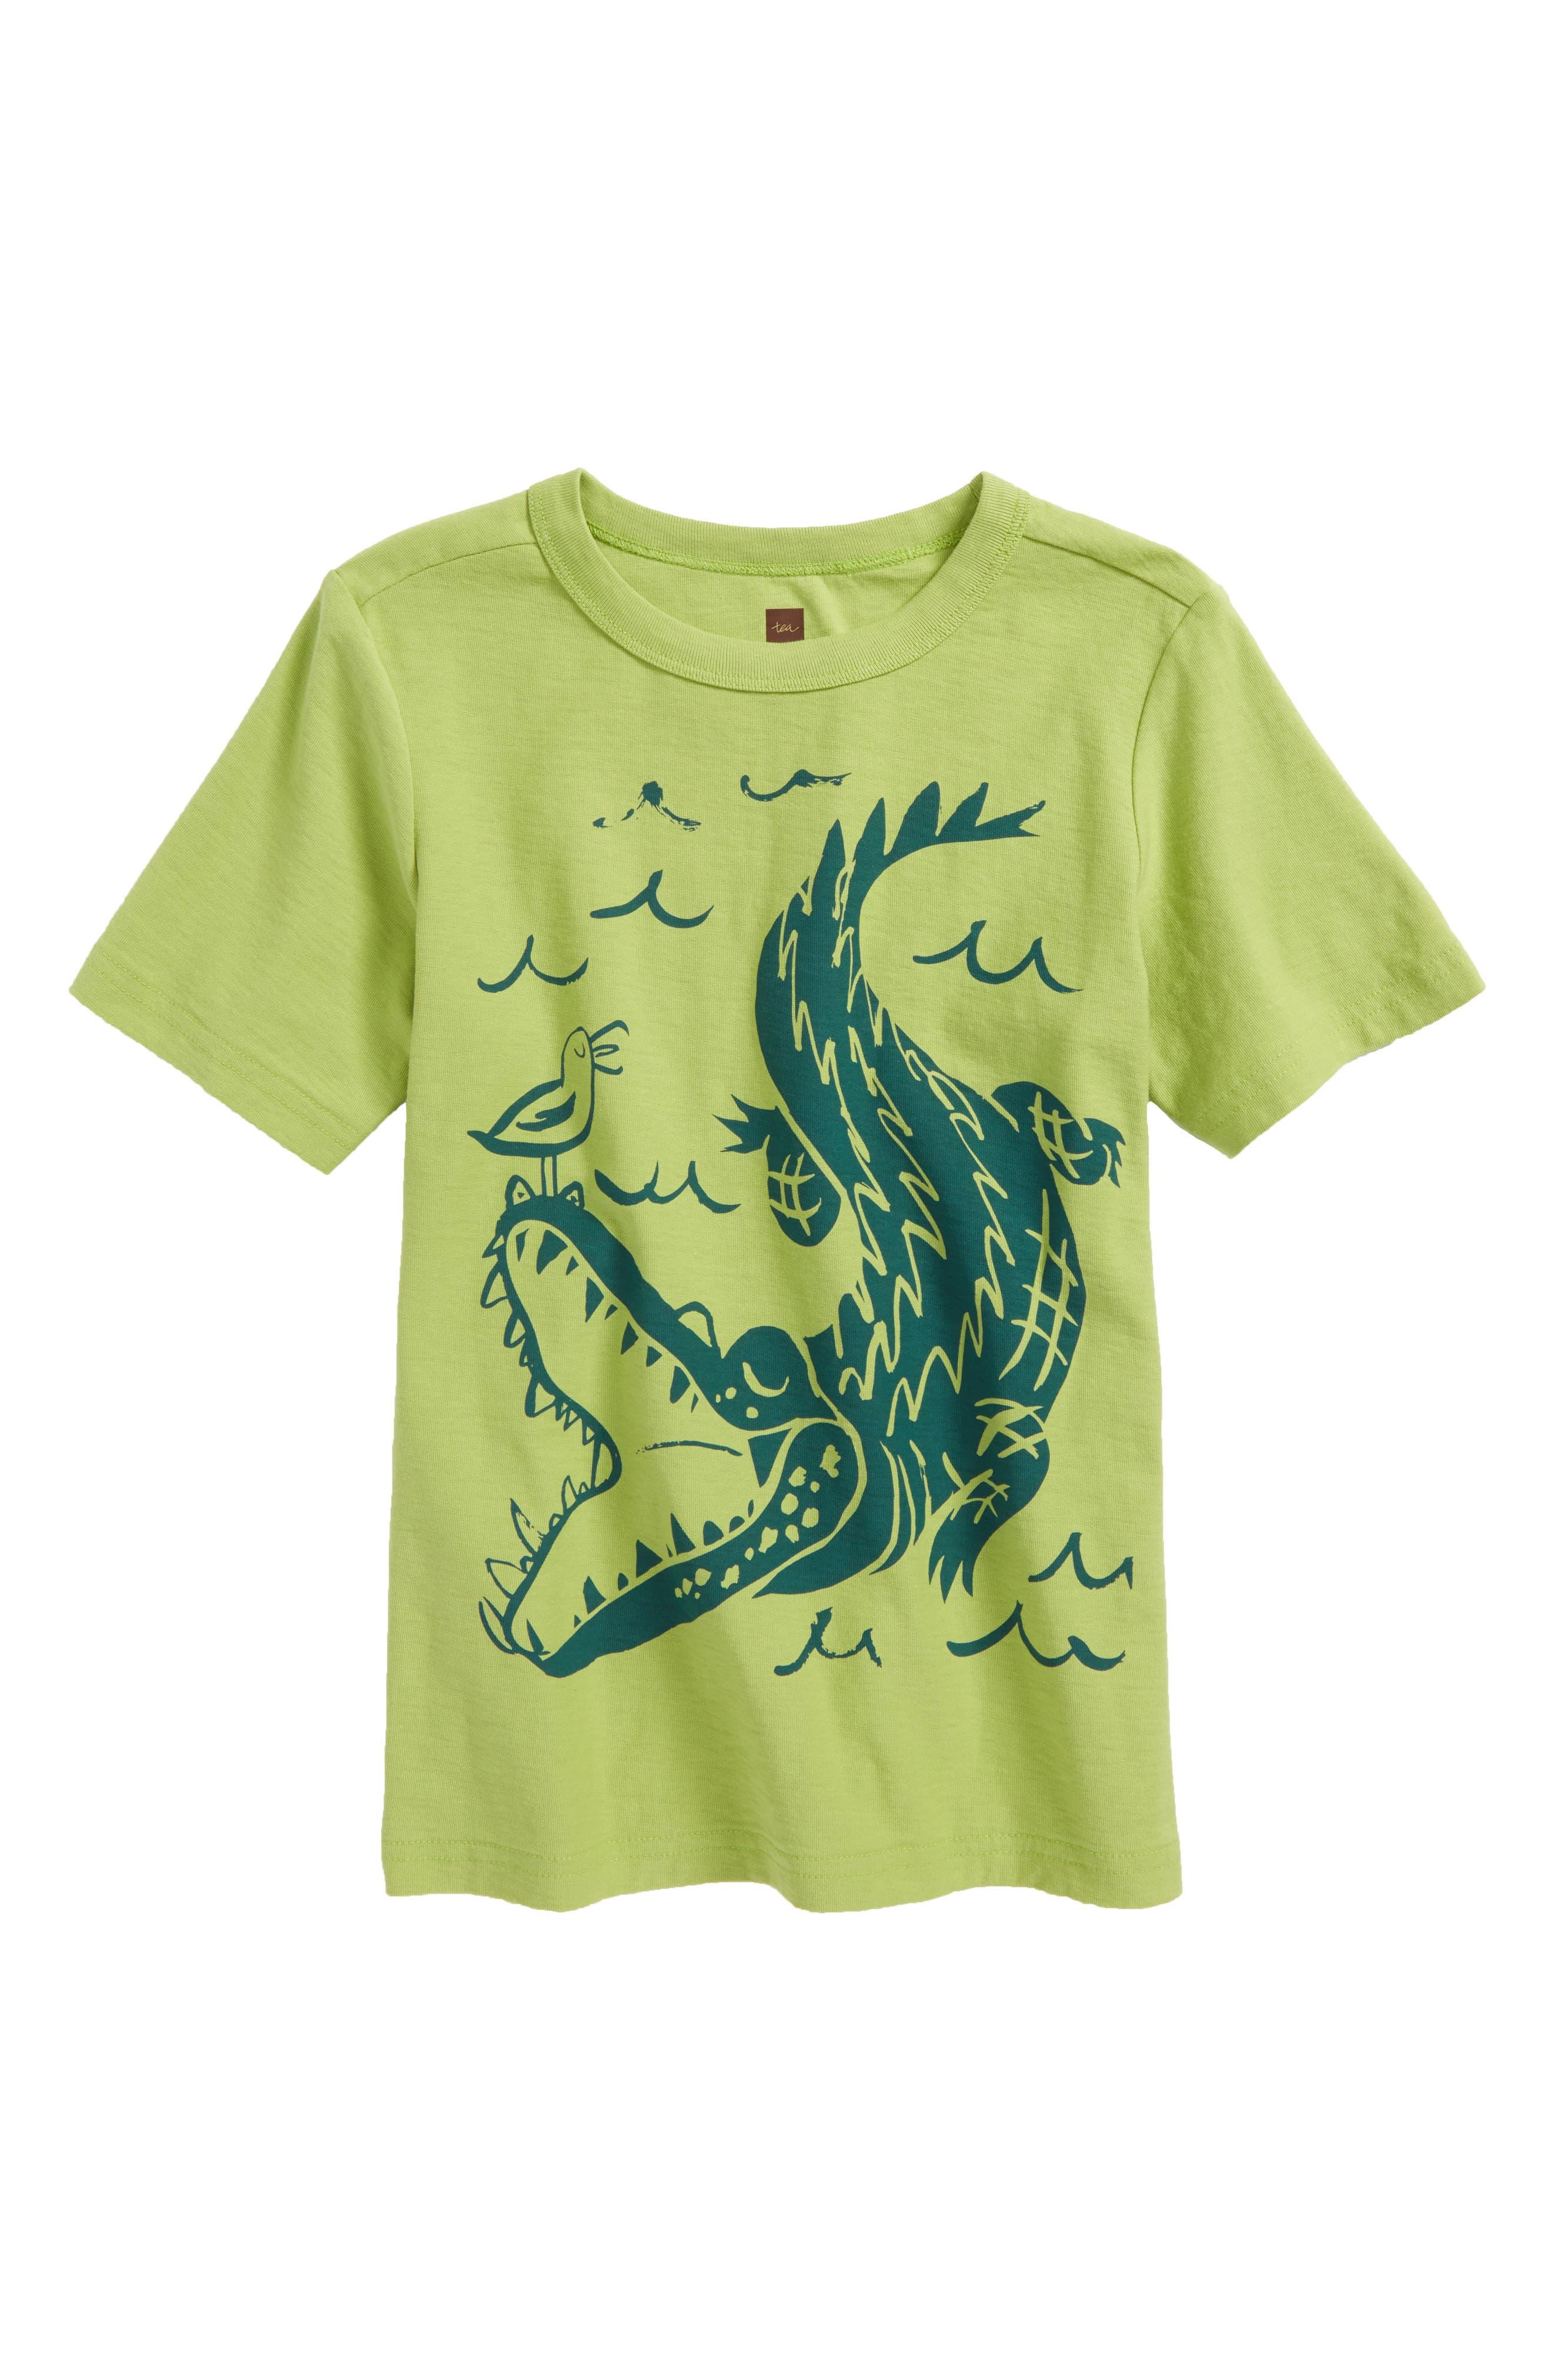 Alligator T-Shirt,                             Main thumbnail 1, color,                             Peridot